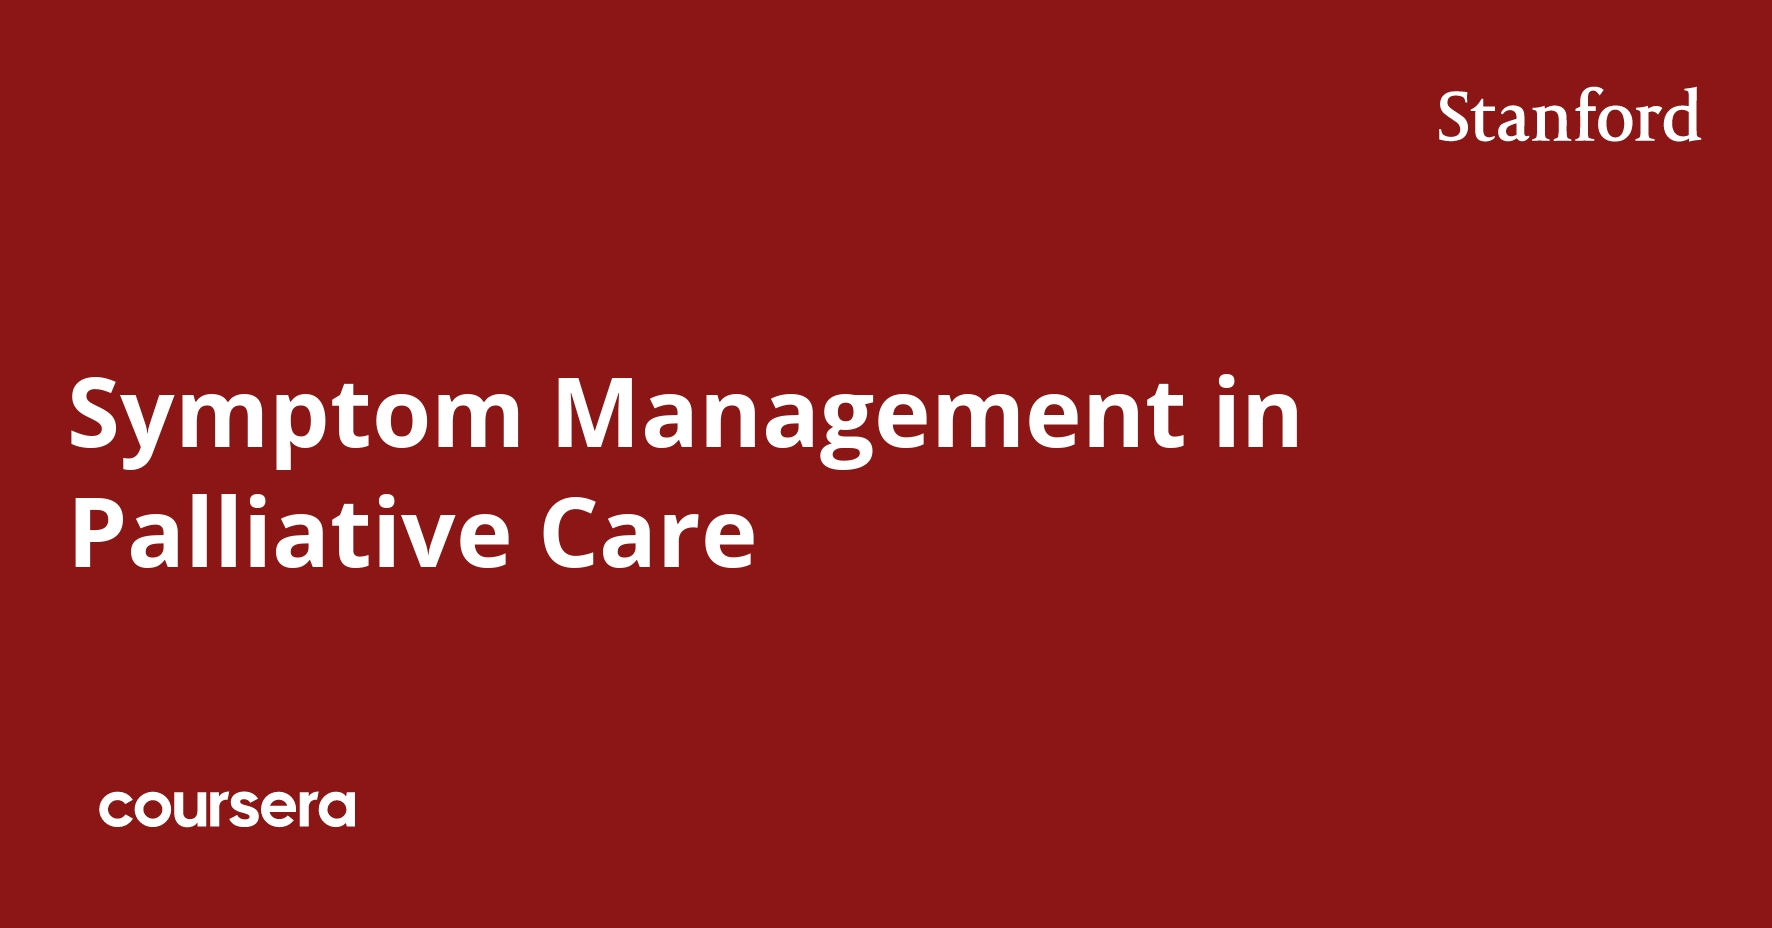 Symptom Management in Palliative Care